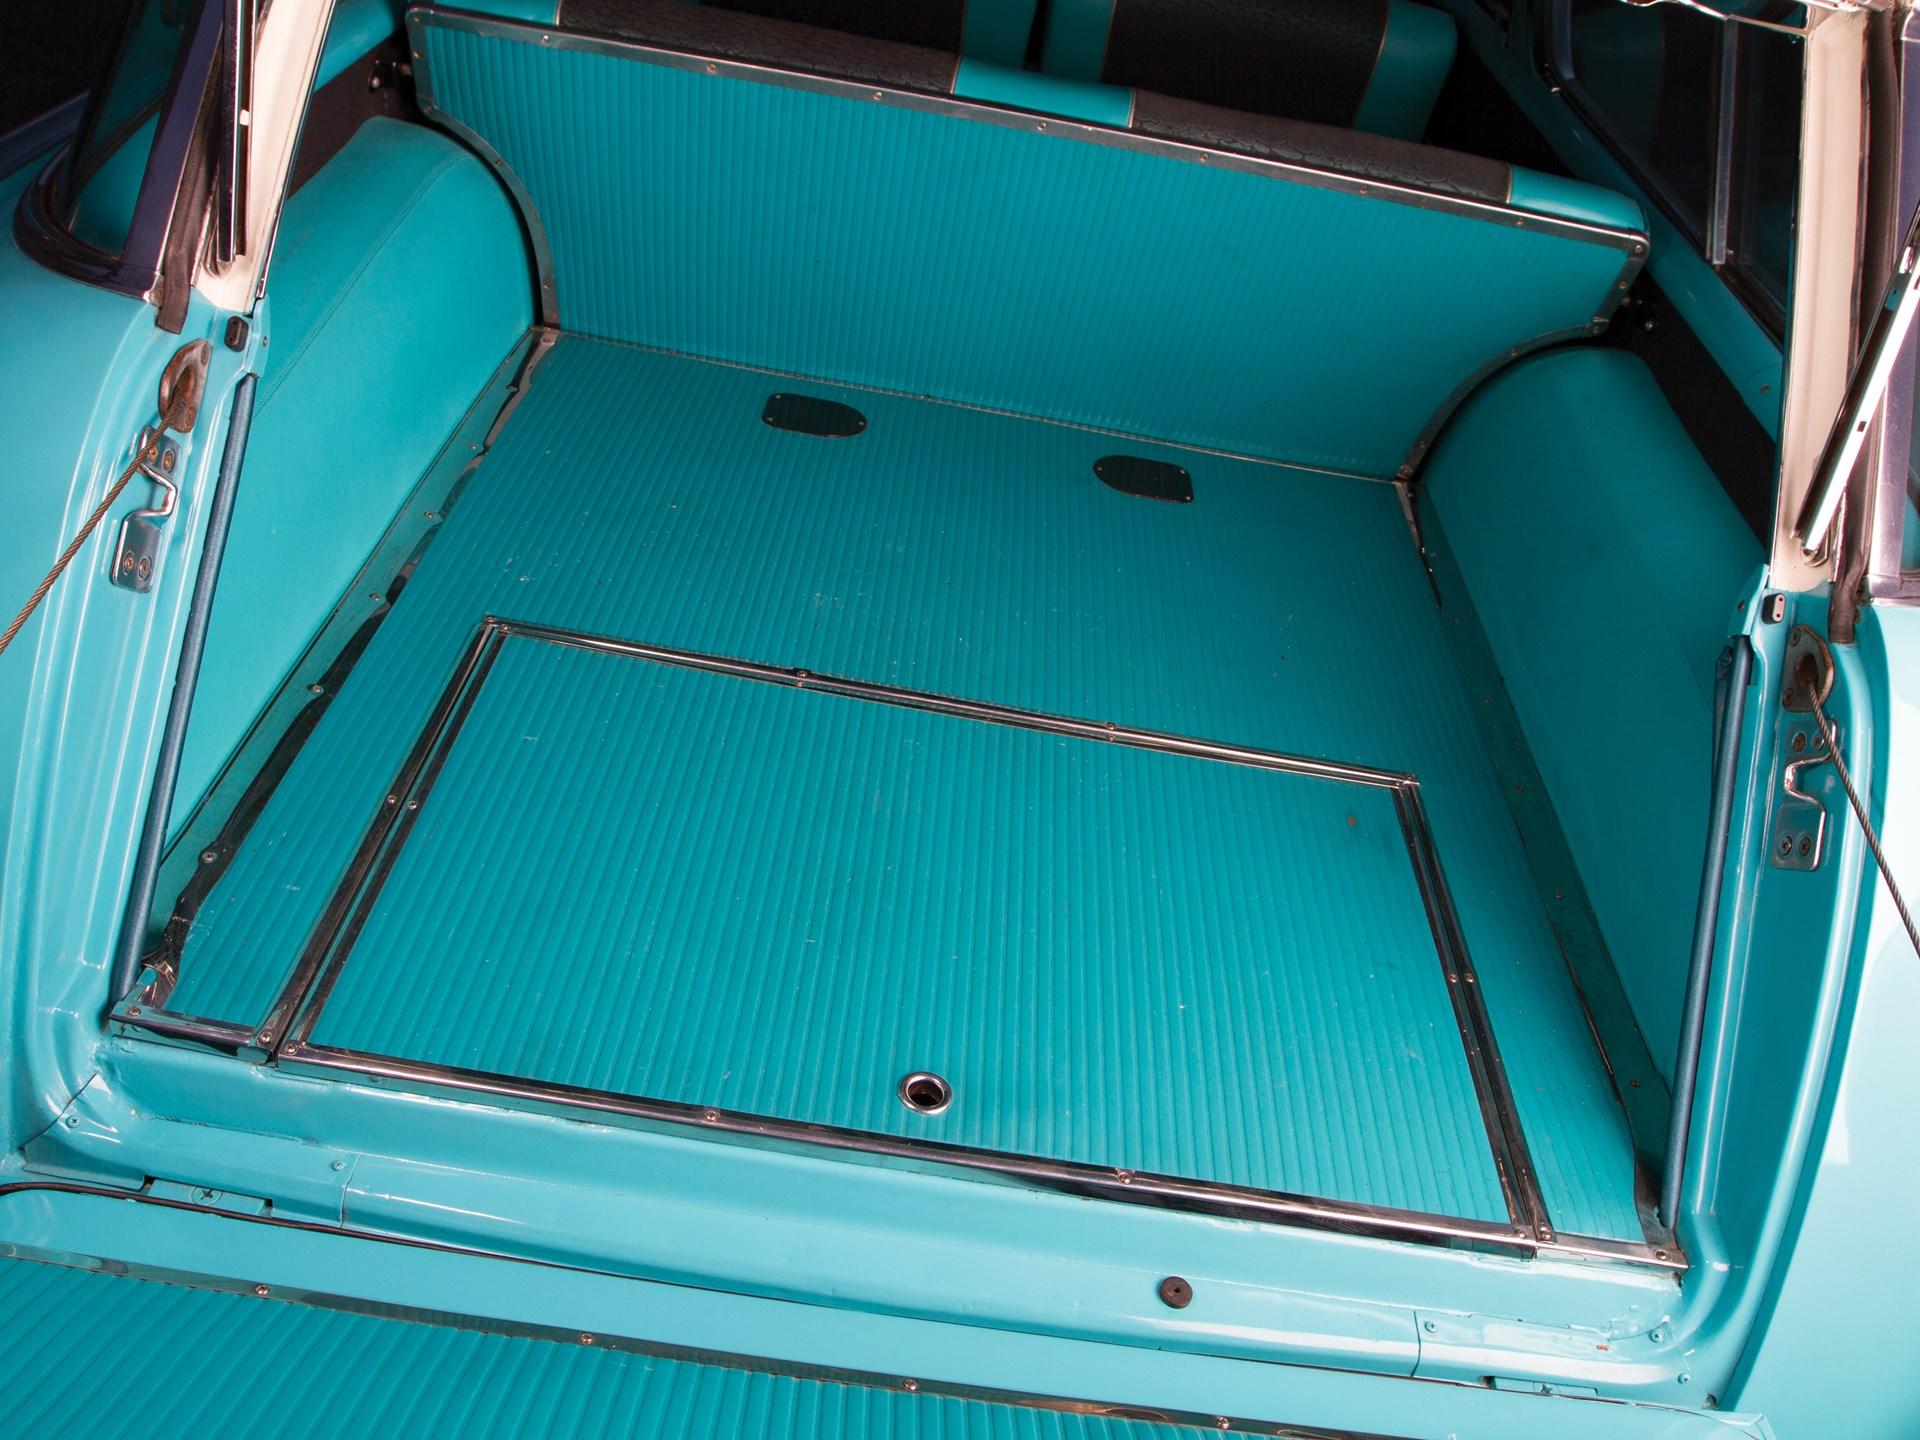 1957 Chevrolet Bel Air Nomad rear trunk